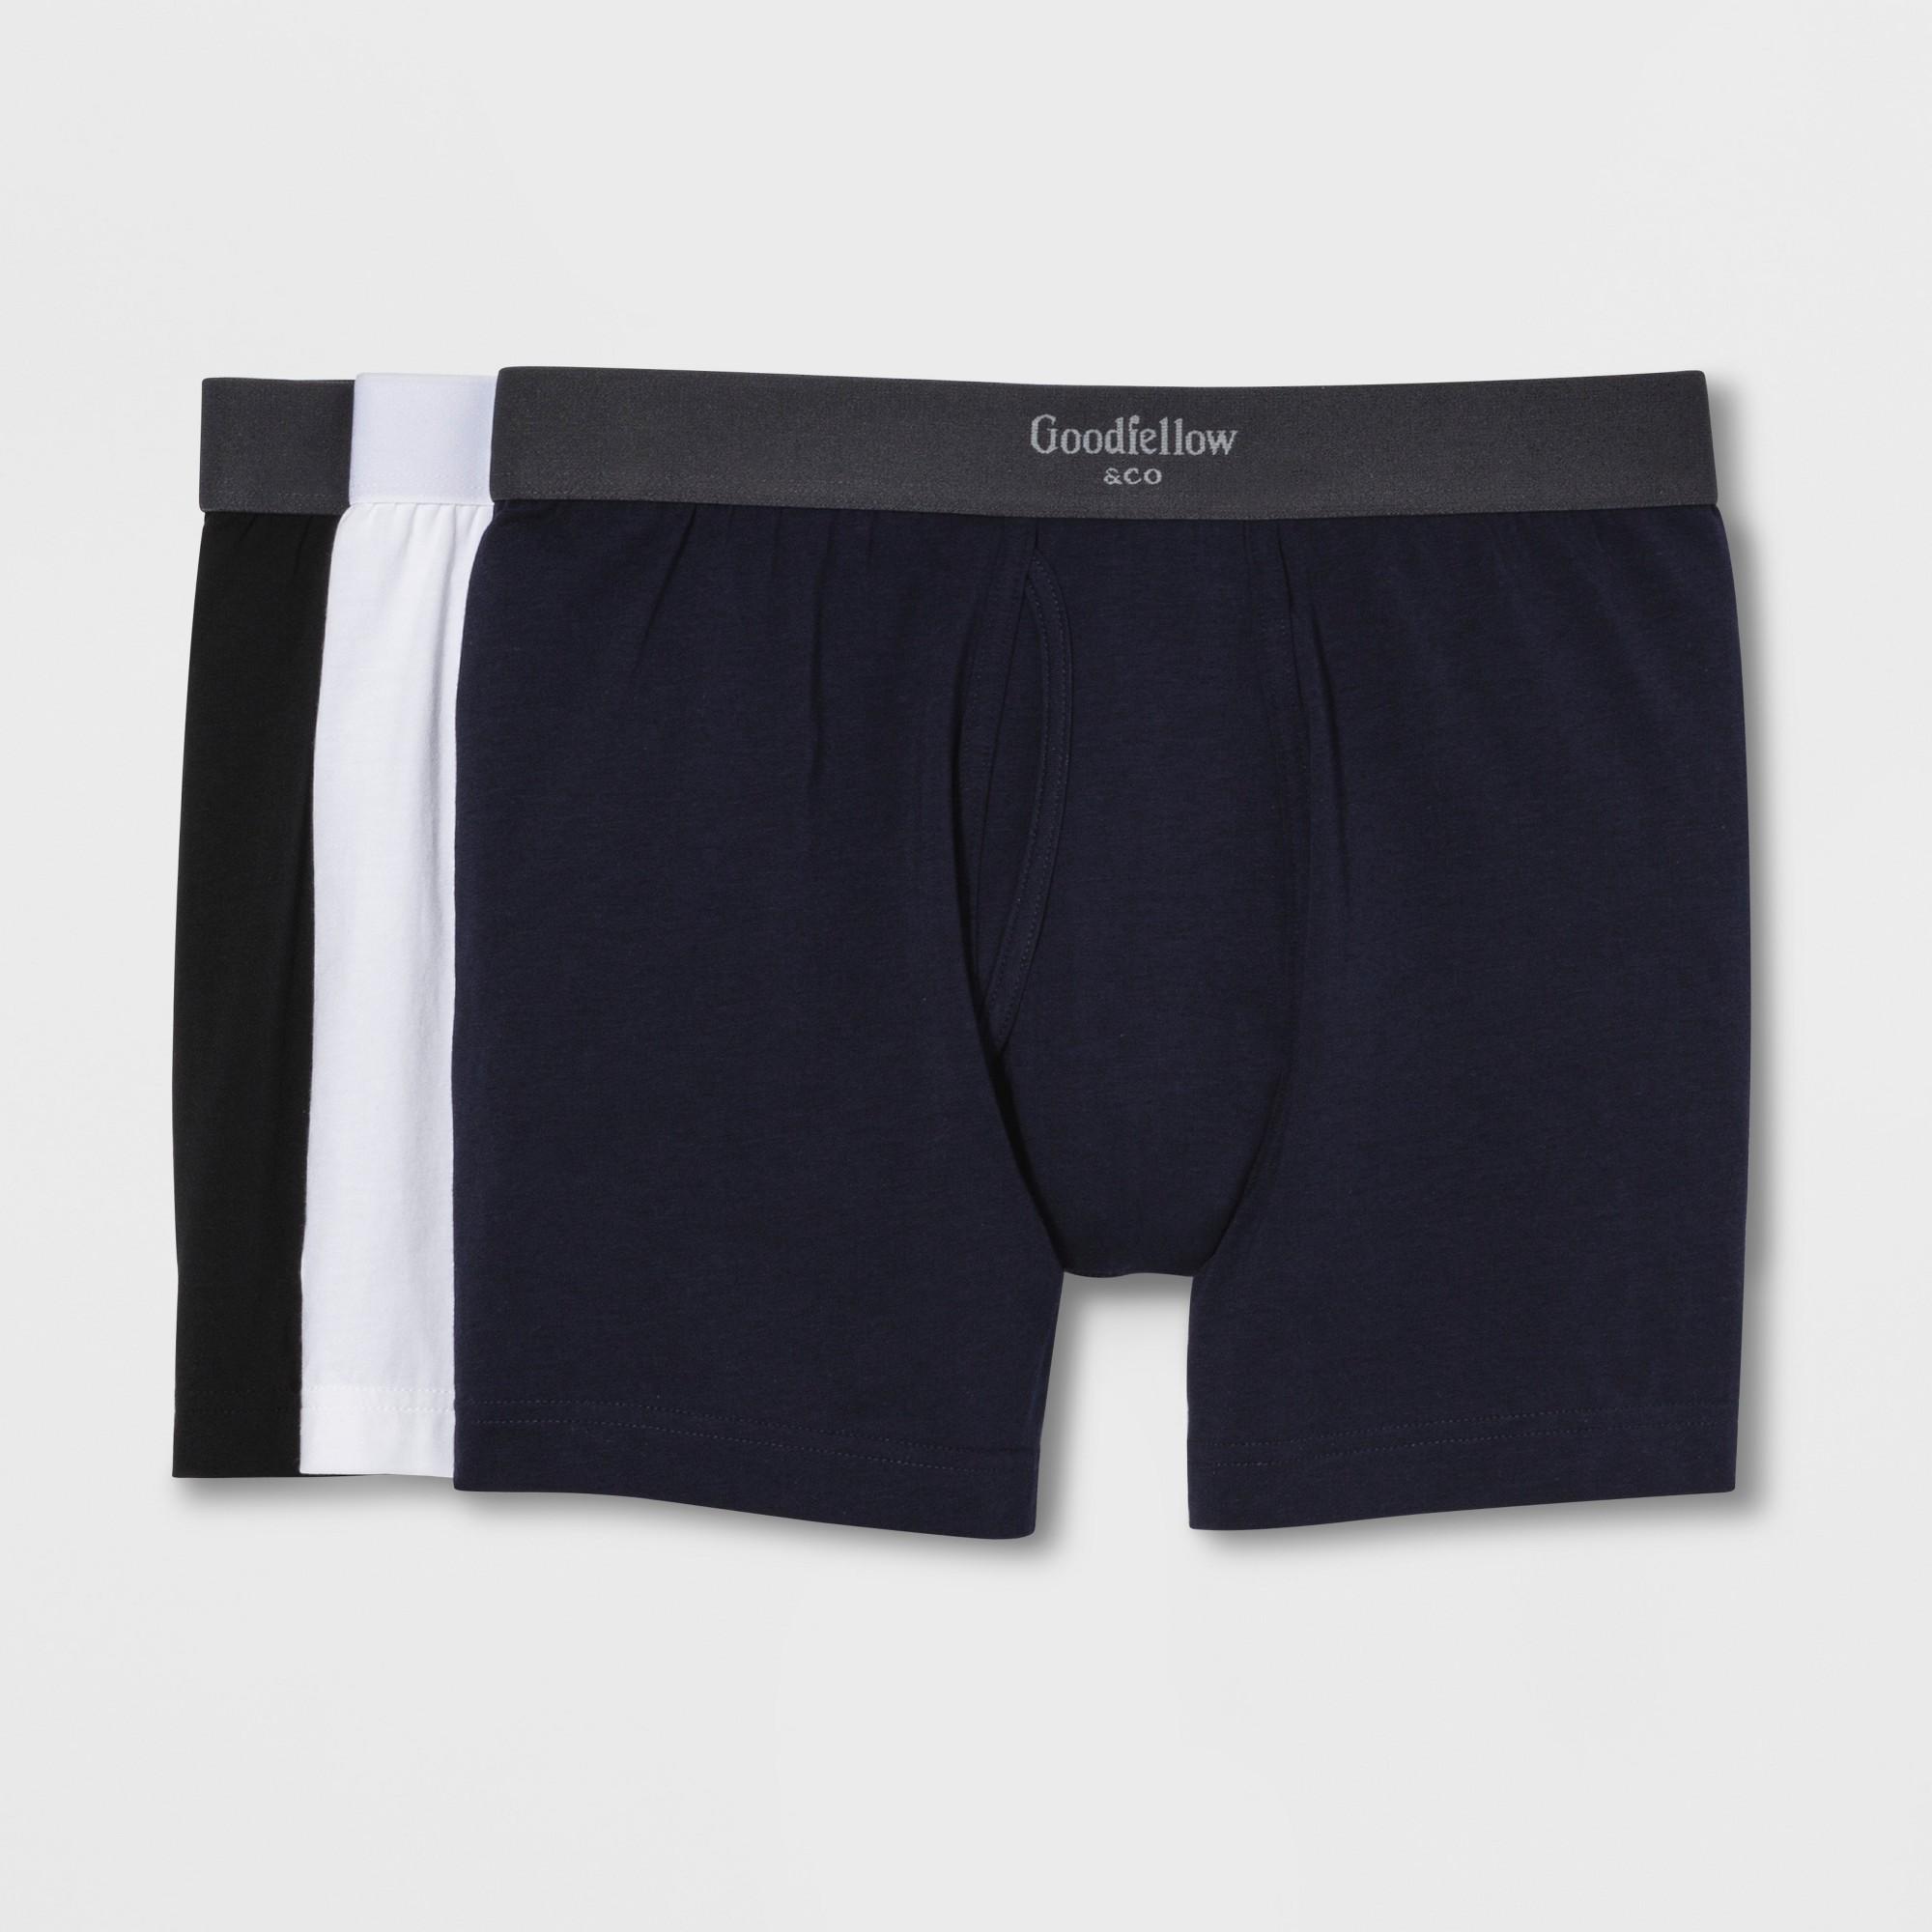 Men's Premium Knit Boxer Briefs 3pk - Goodfellow & Co 2XL, Multi-Colored